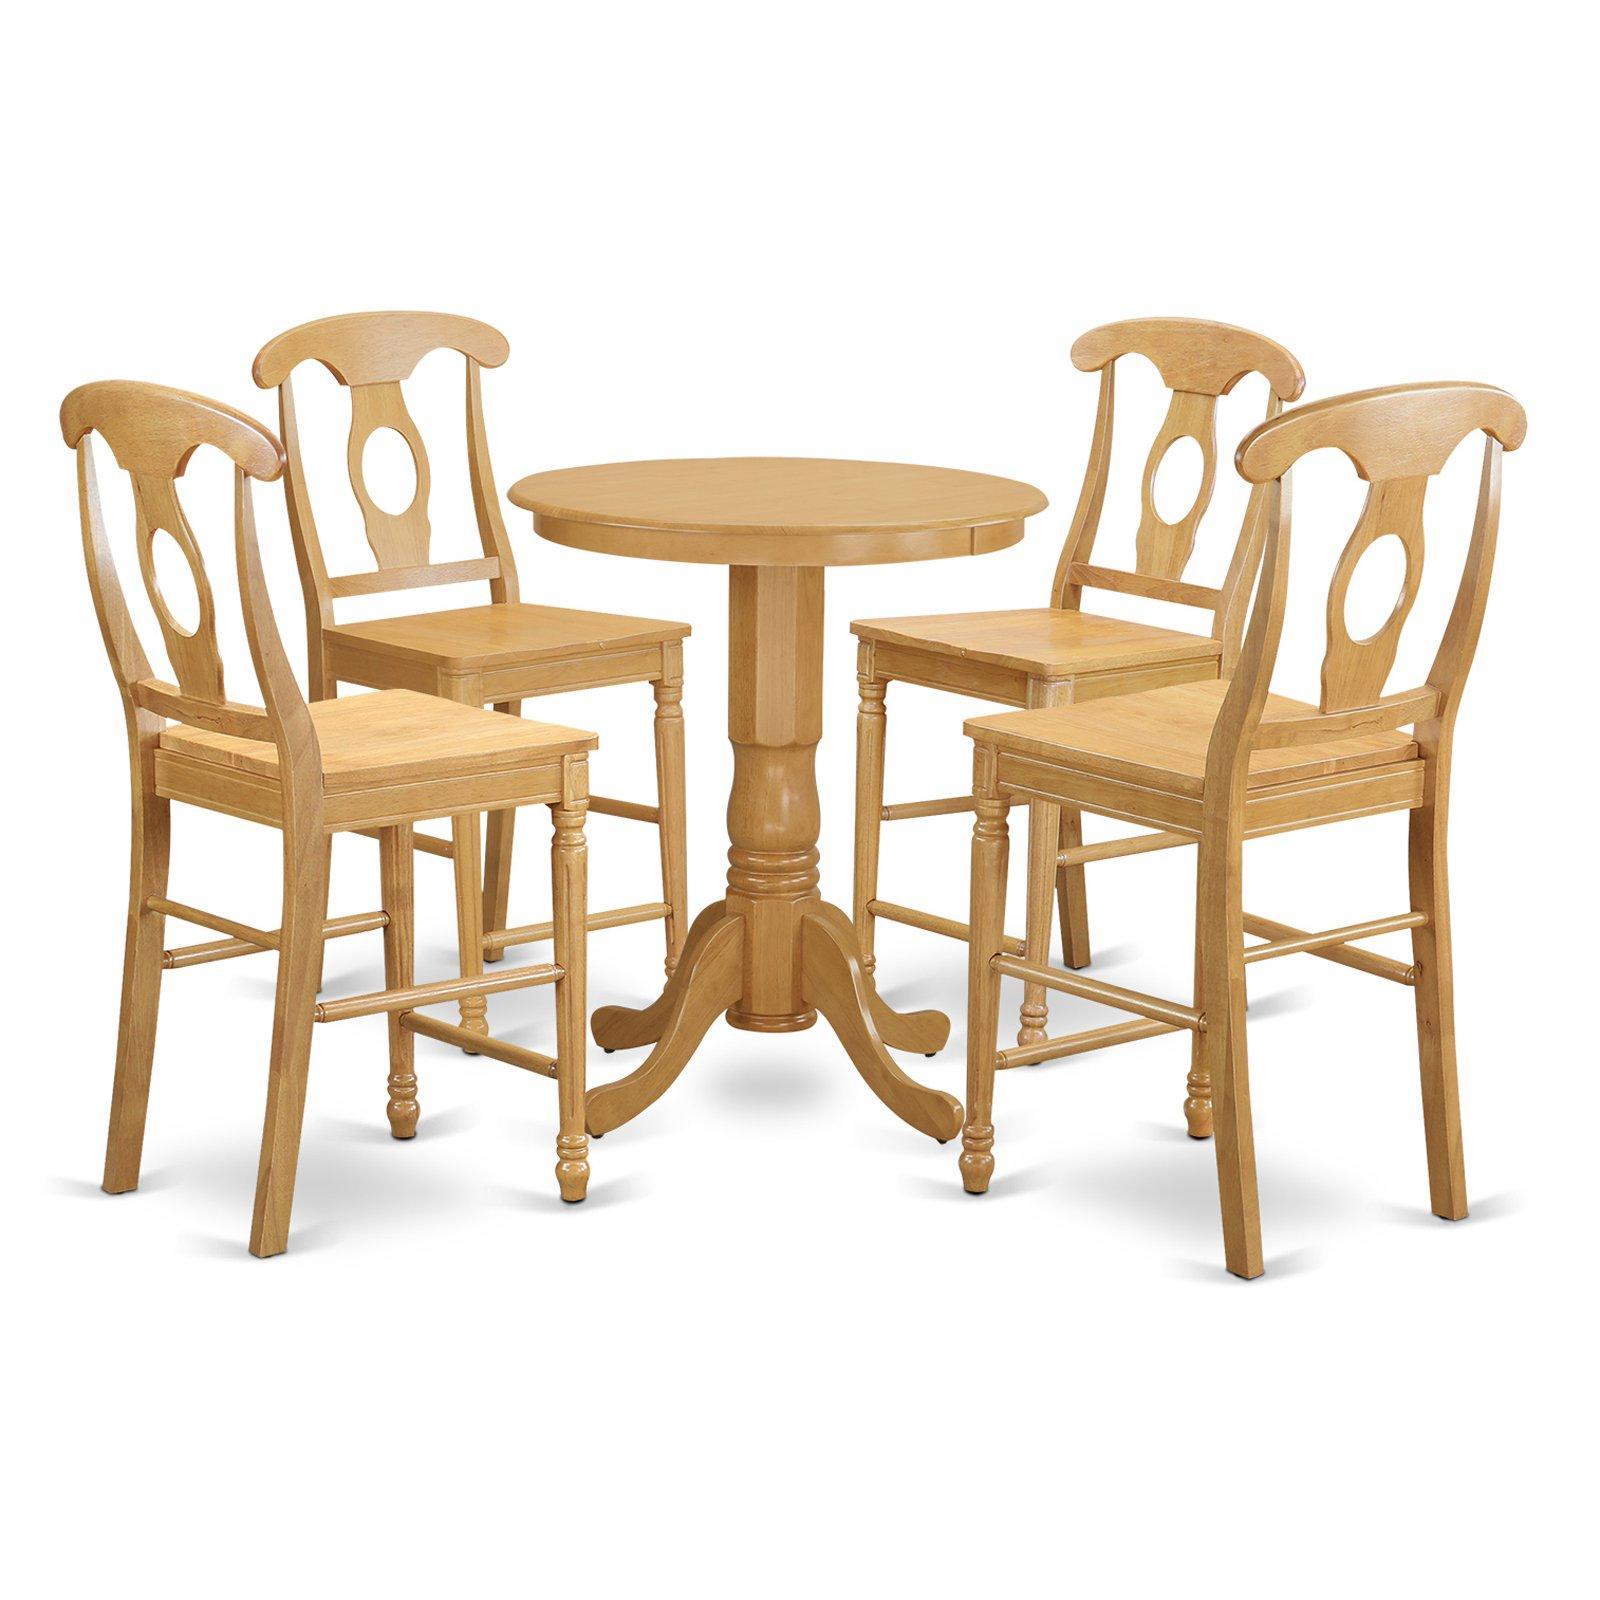 East West Furniture Eden 5 Piece Keyhole Dining Table Set